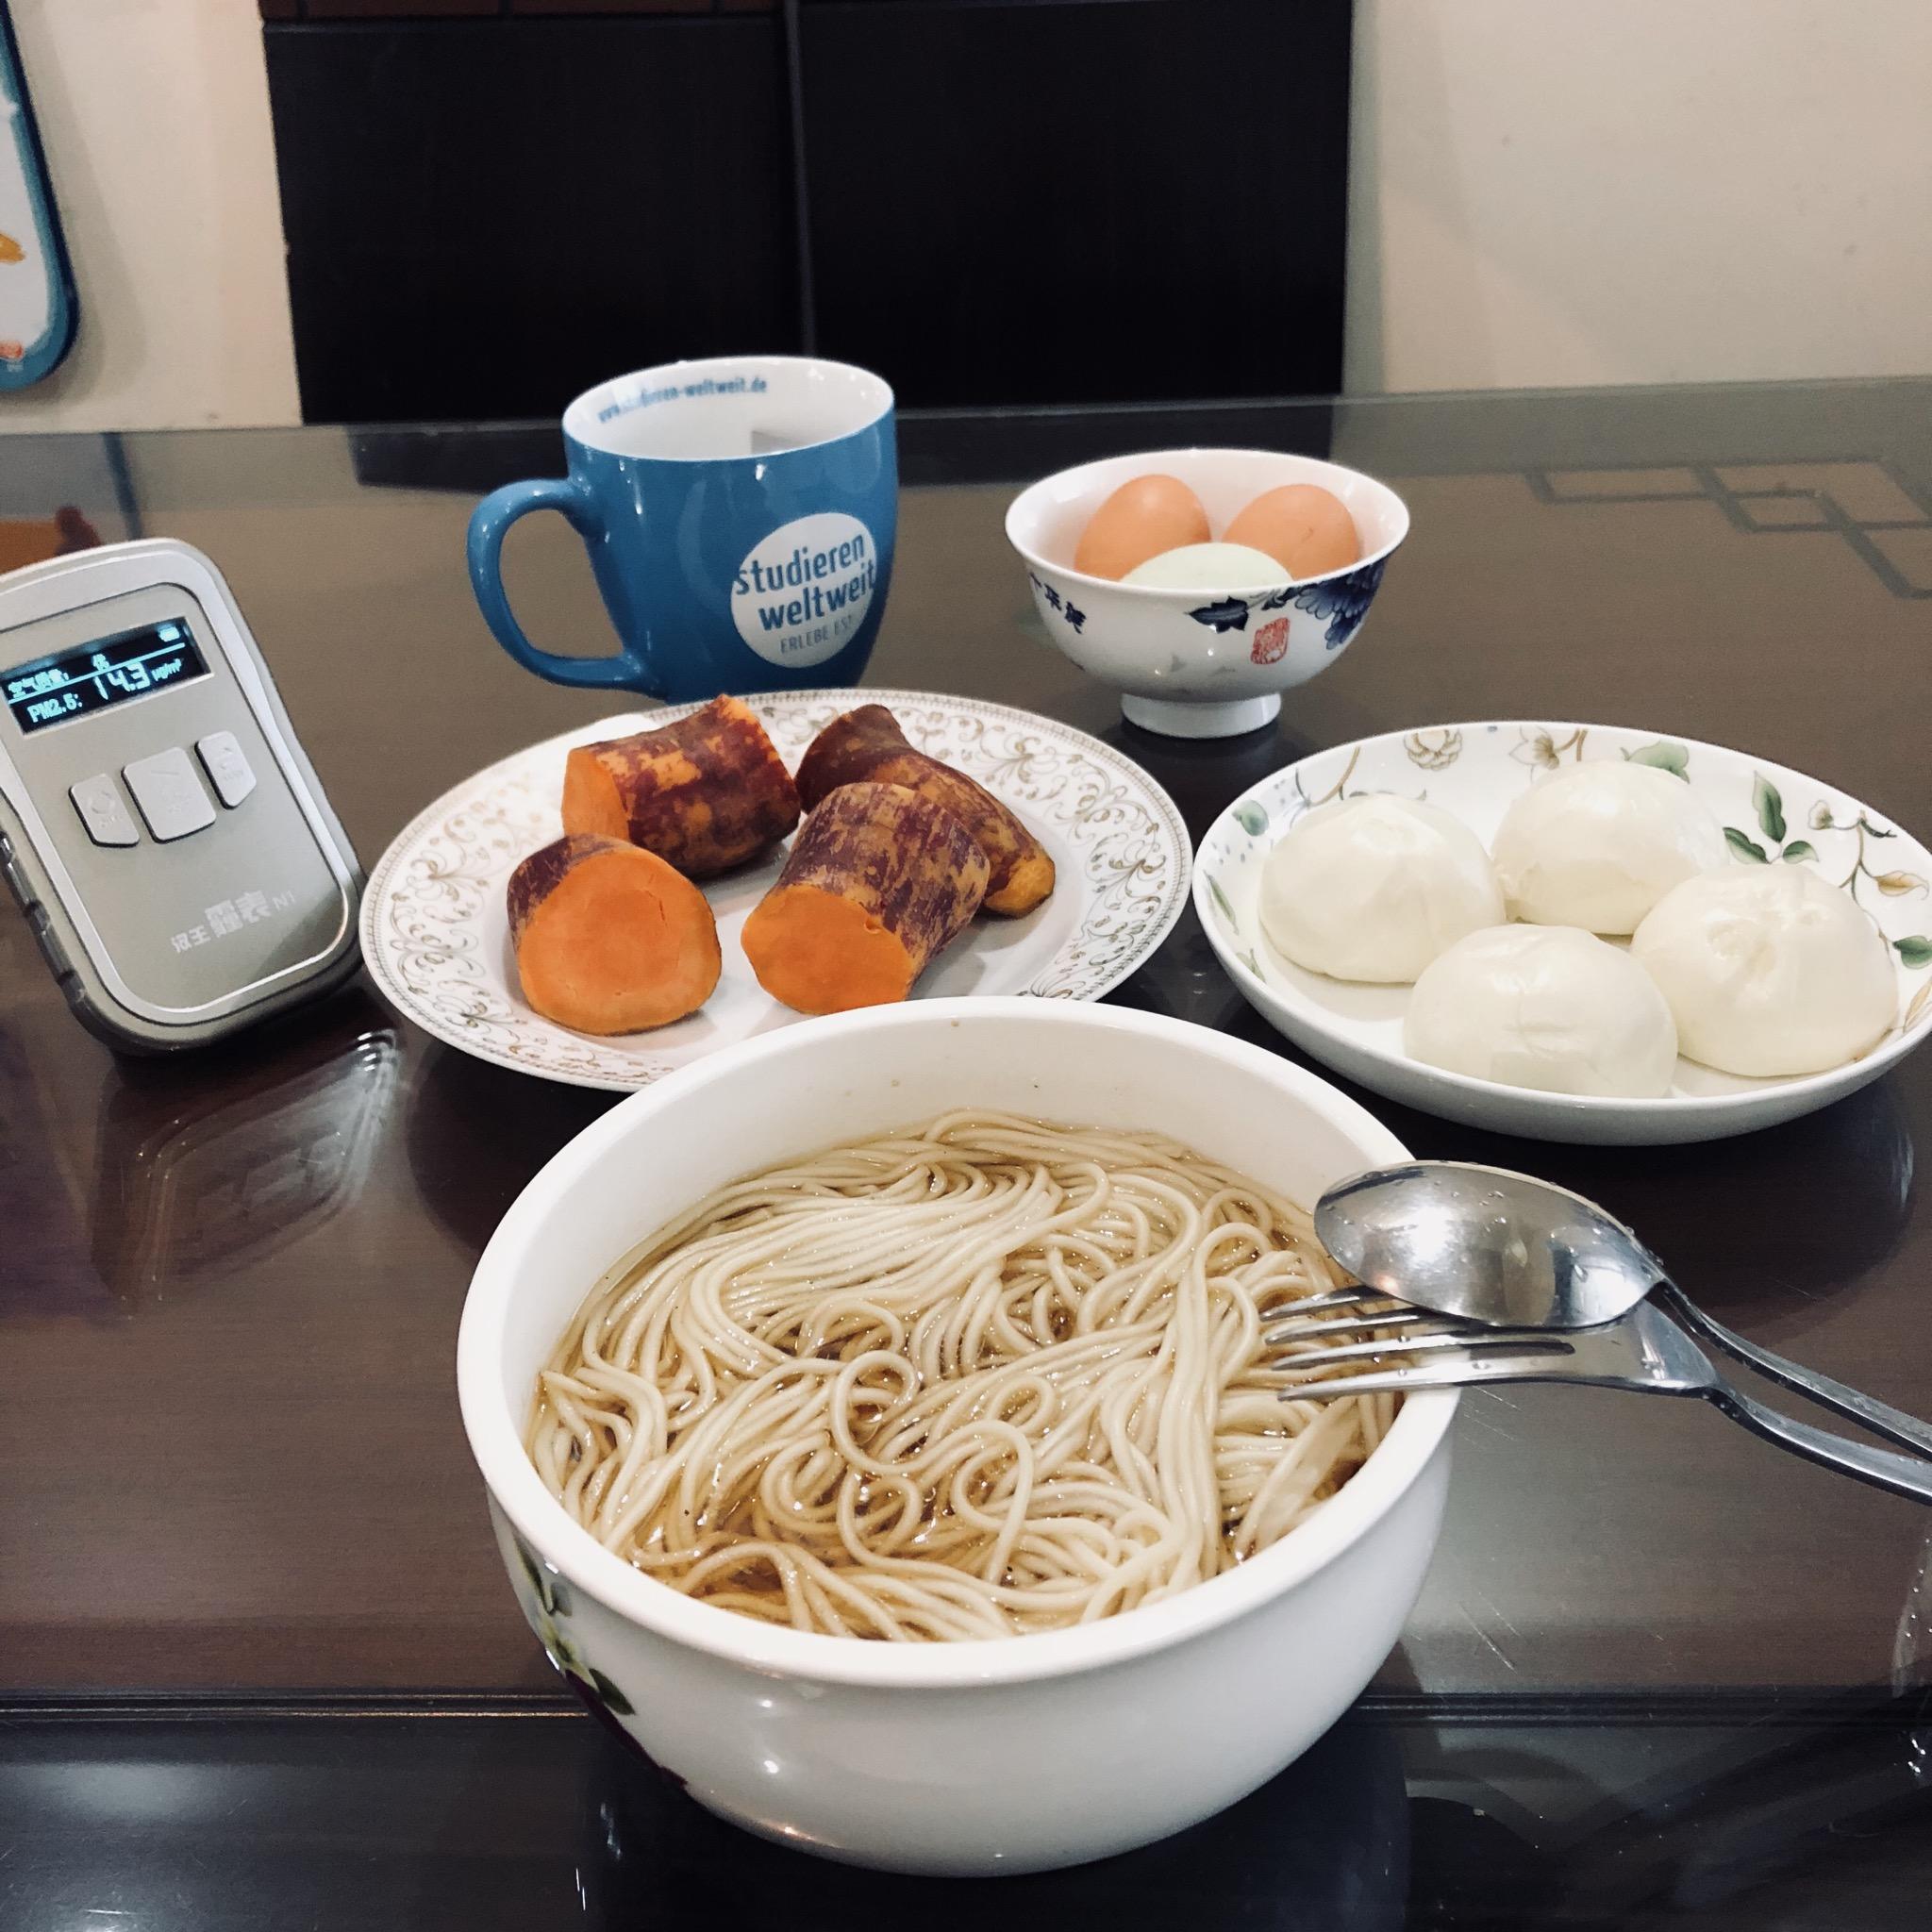 Gut gefrühstückt, trotz schlechter Luft